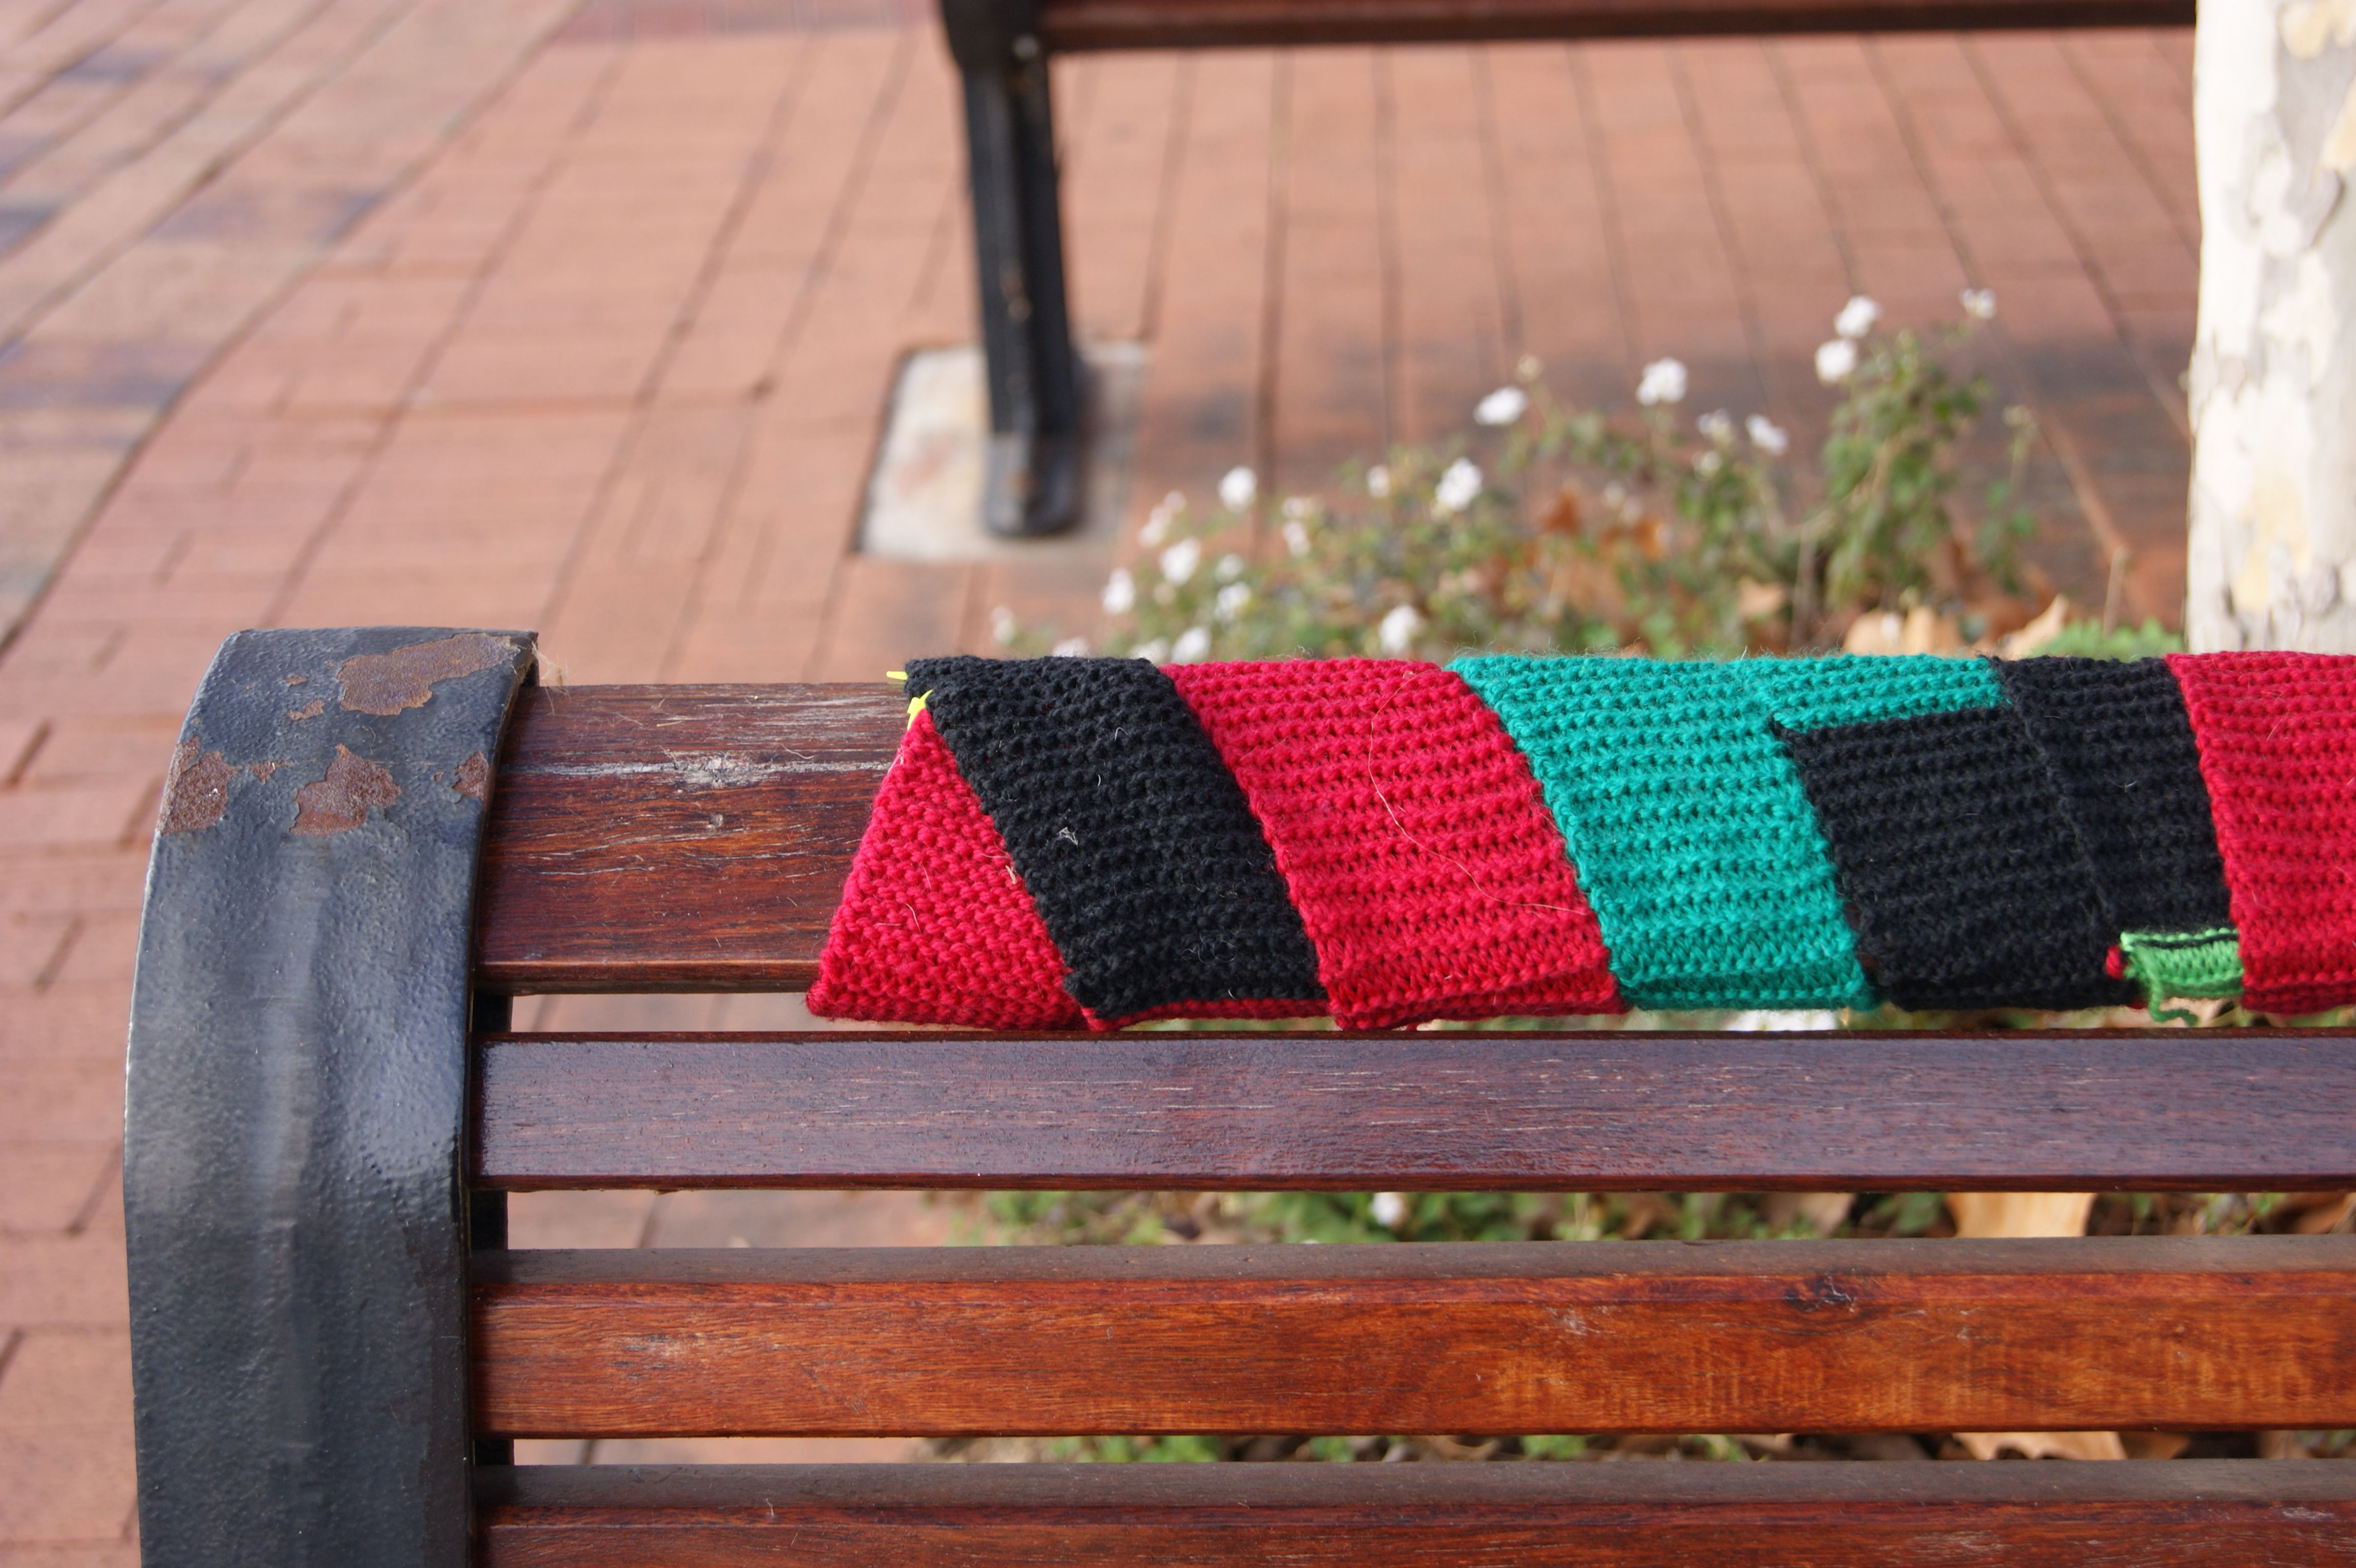 yarn bombing bench - photo #5